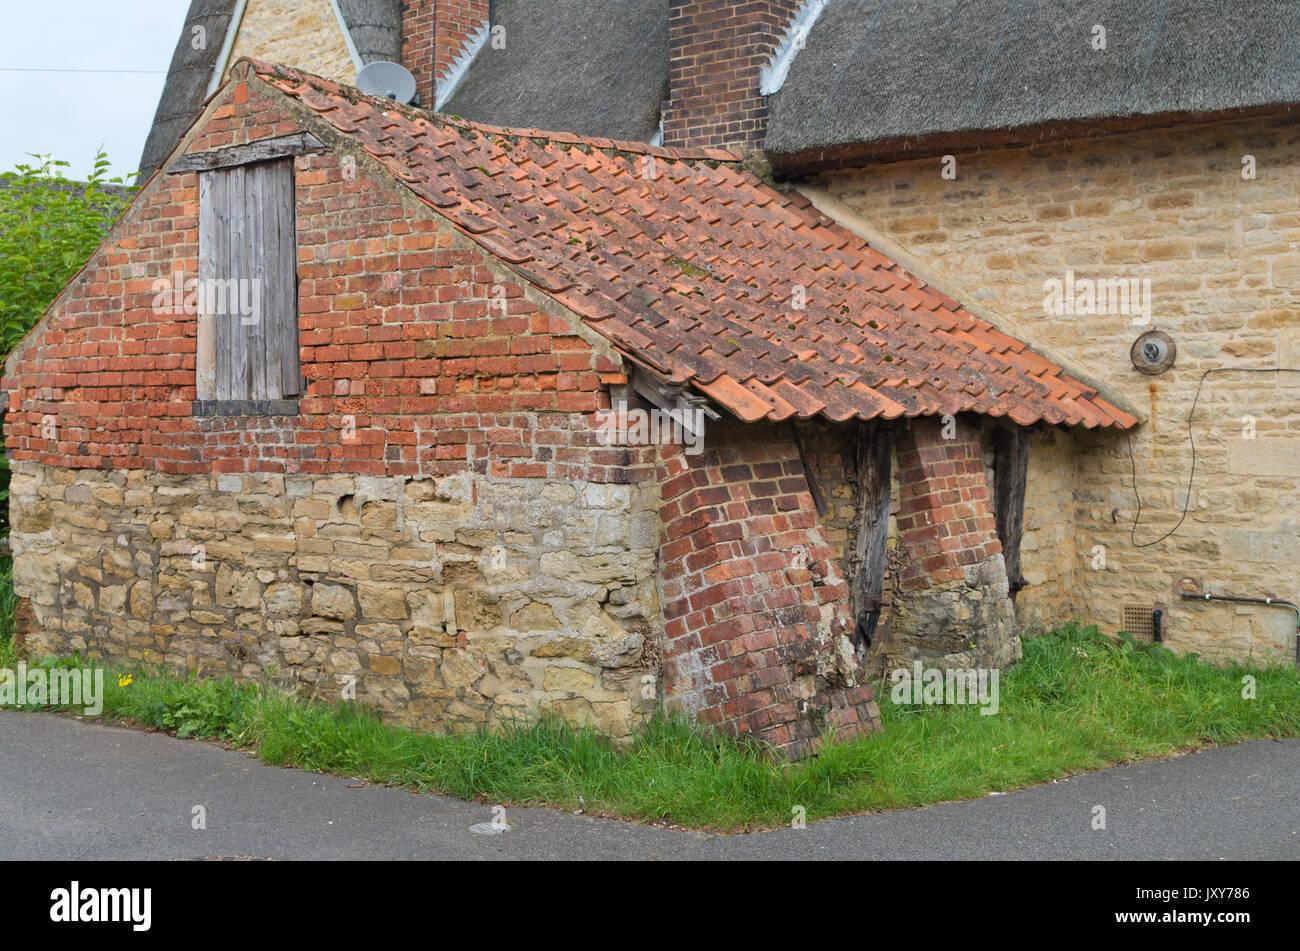 The Old Bakehouse in the village of Geddington, Northamptonshire, UK - Stock Image